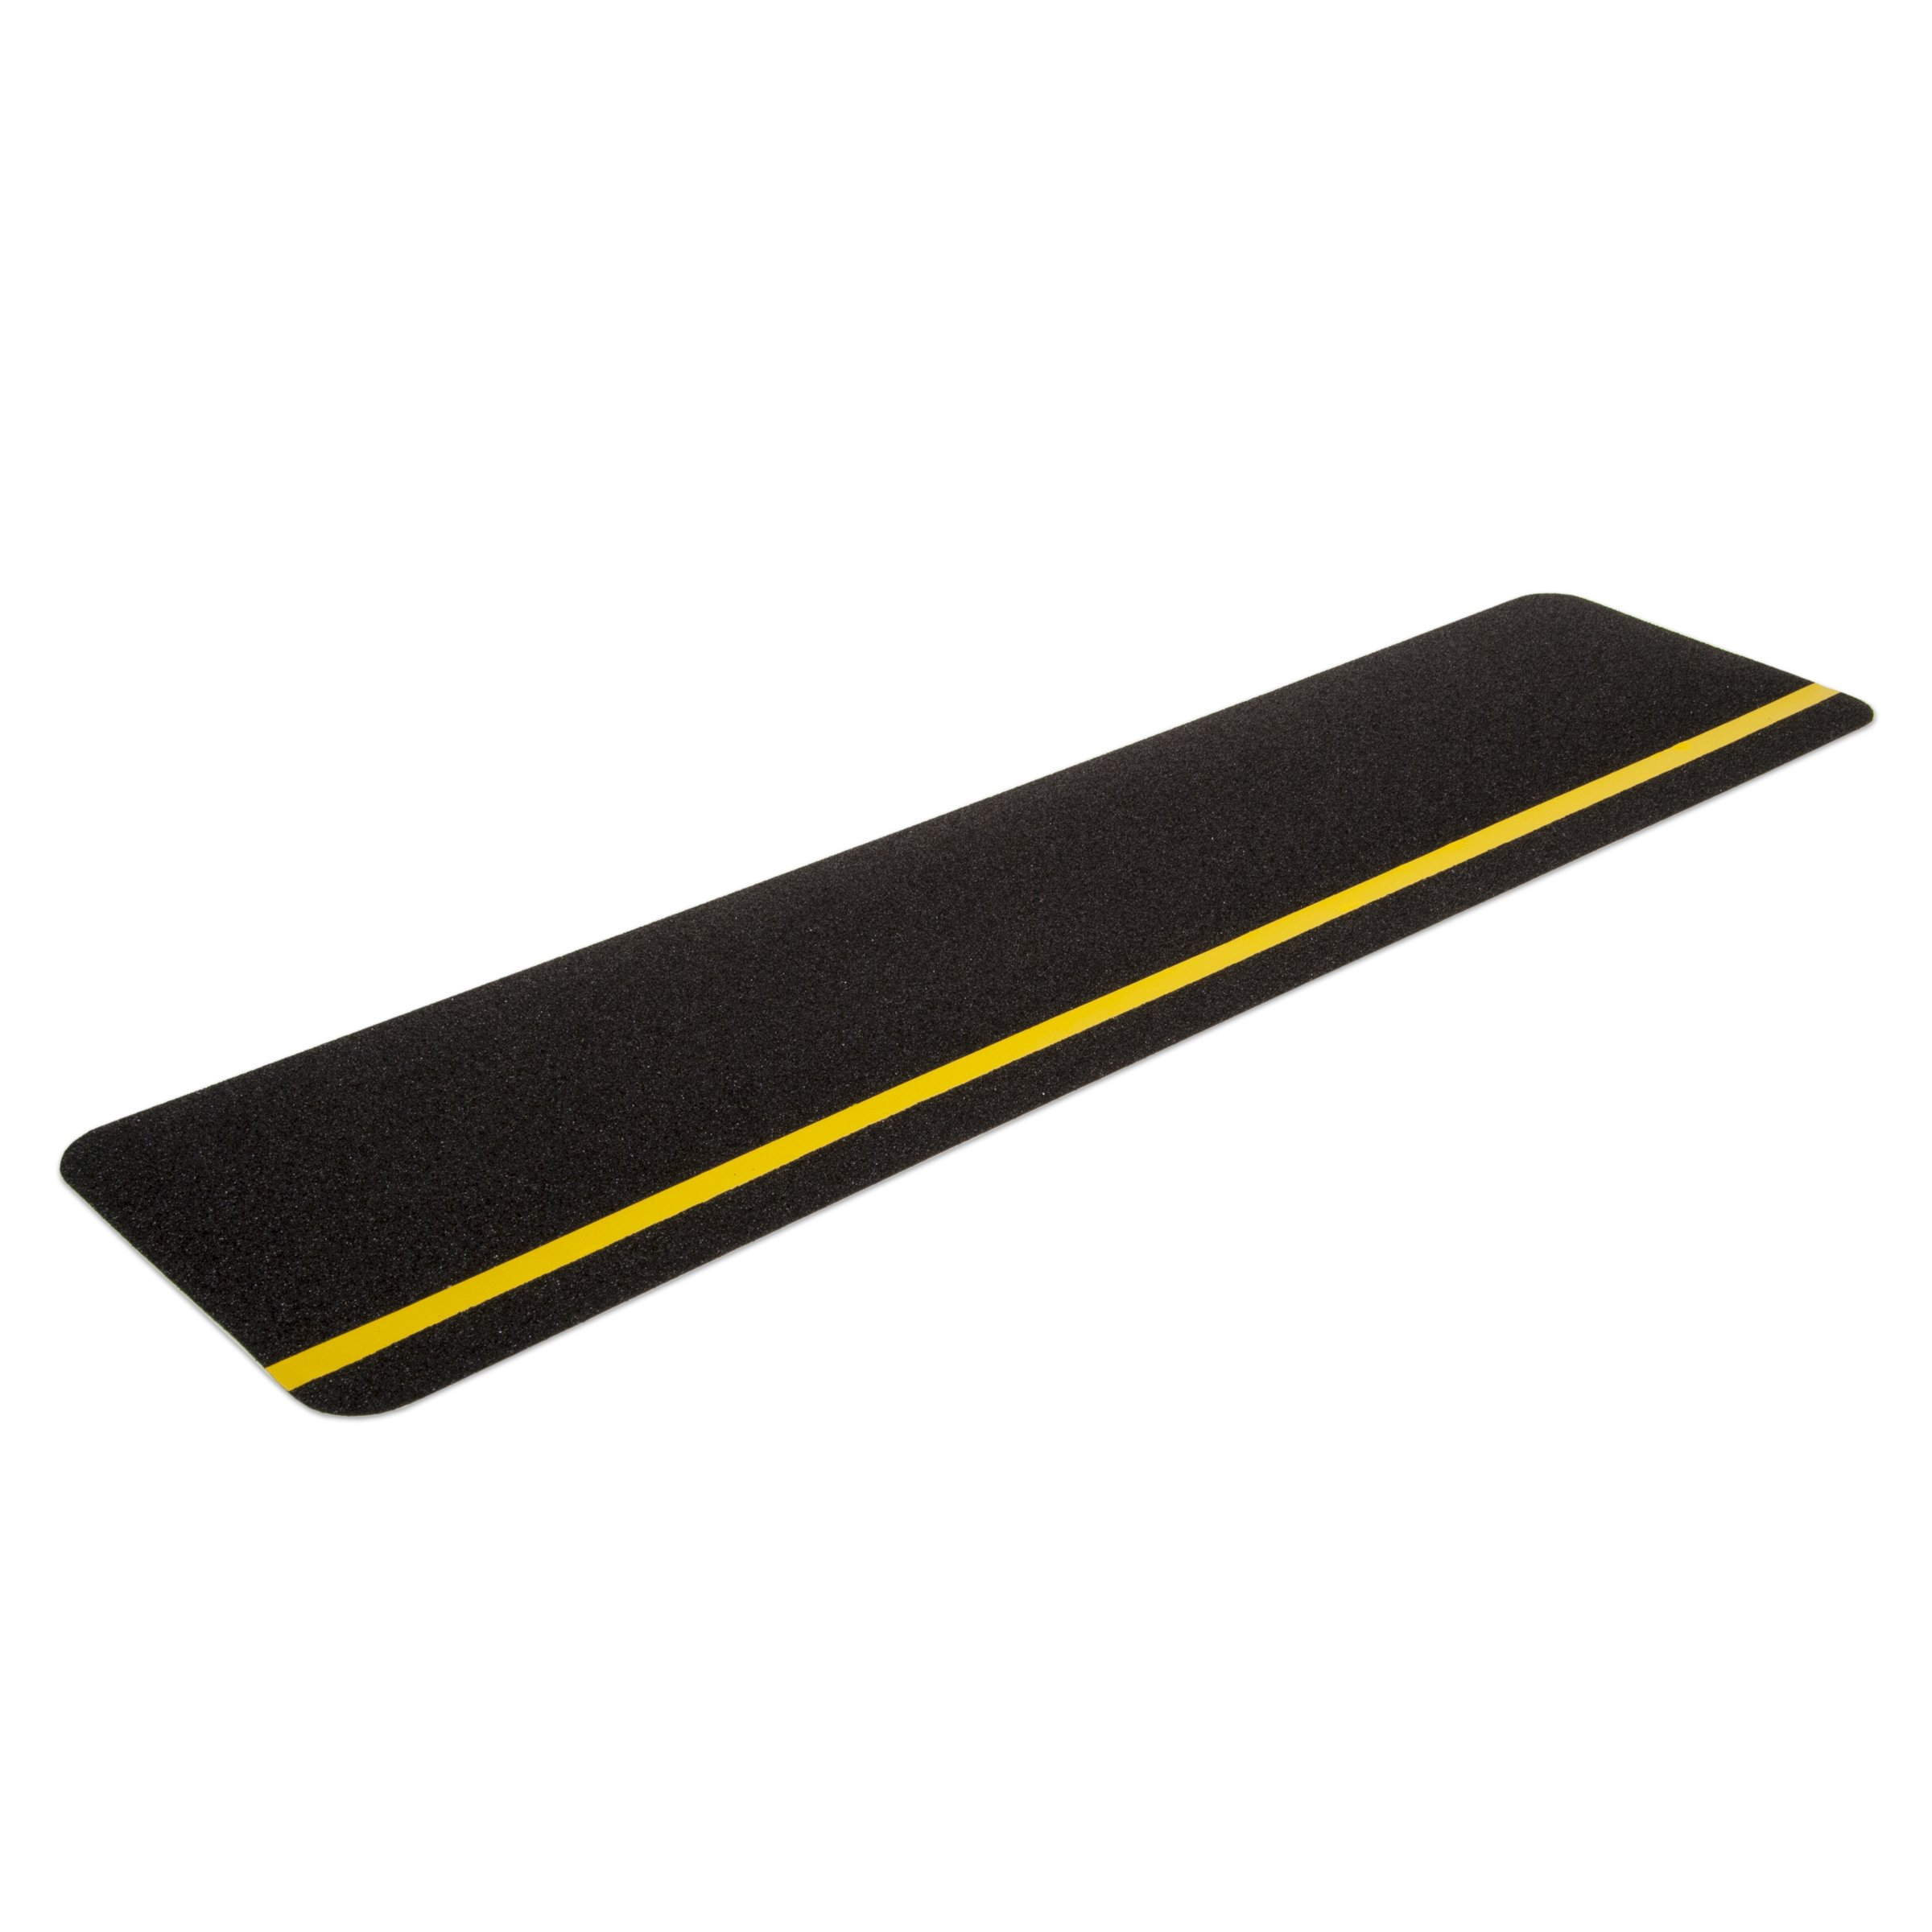 Gator Grip: Anti-Slip Cleats, 6'' x 24'', Reflective Yellow Stripe, (Pack of 10)